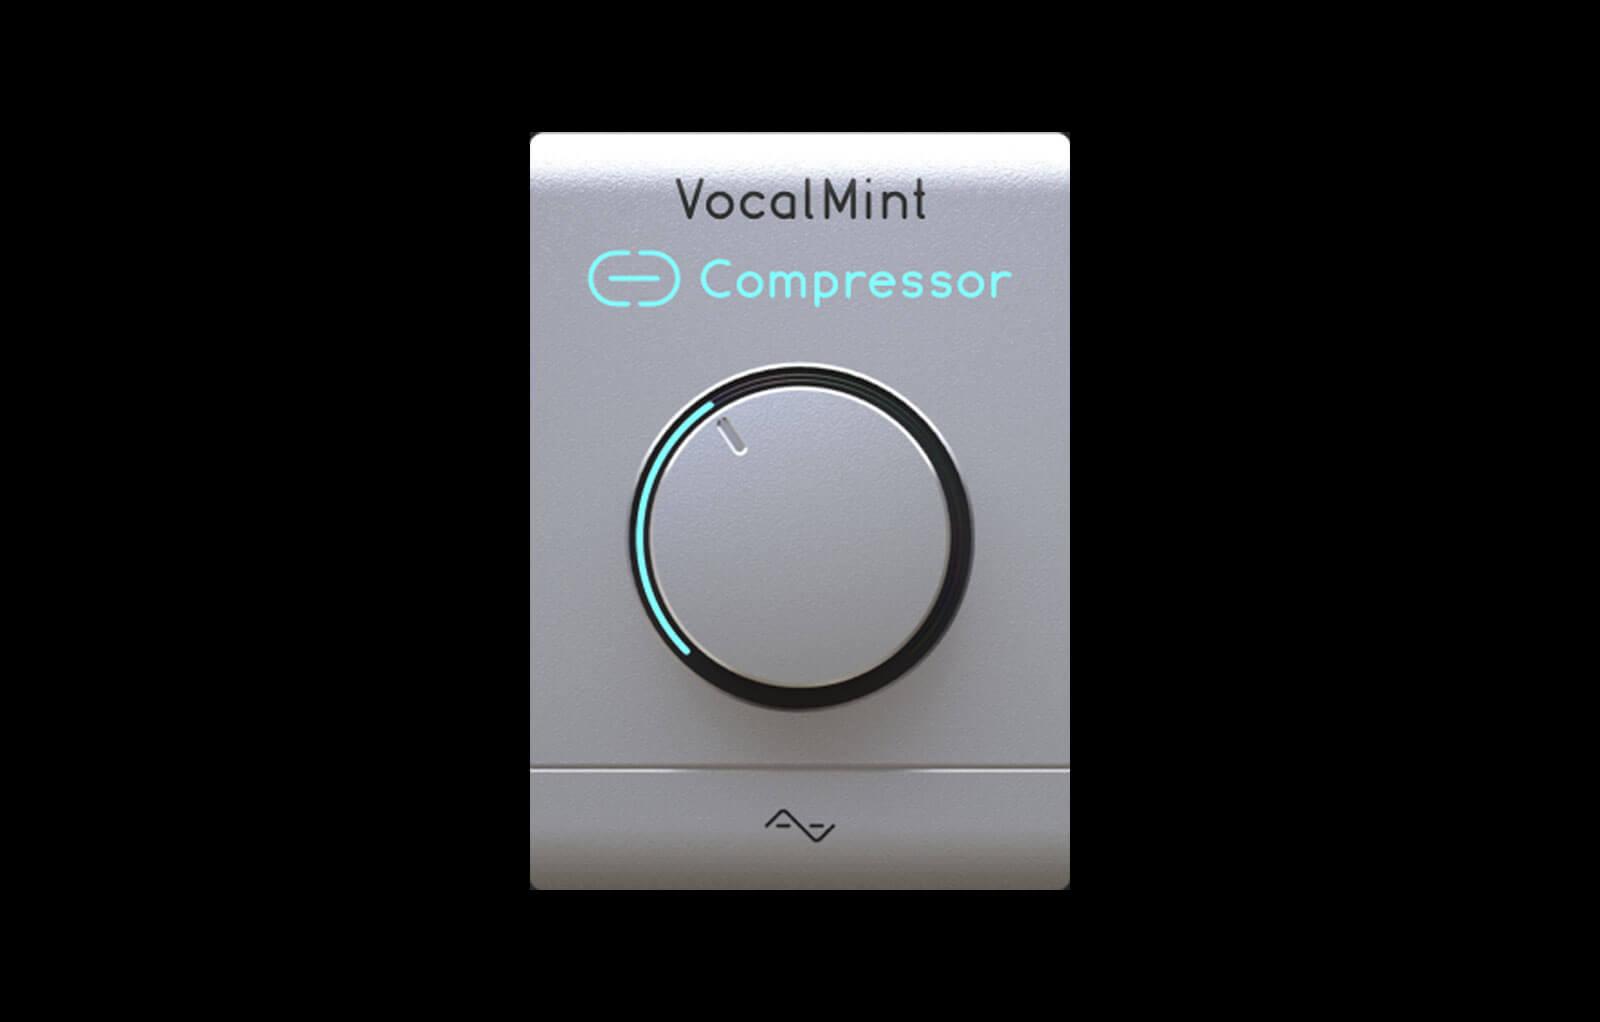 VocalMint Compressor